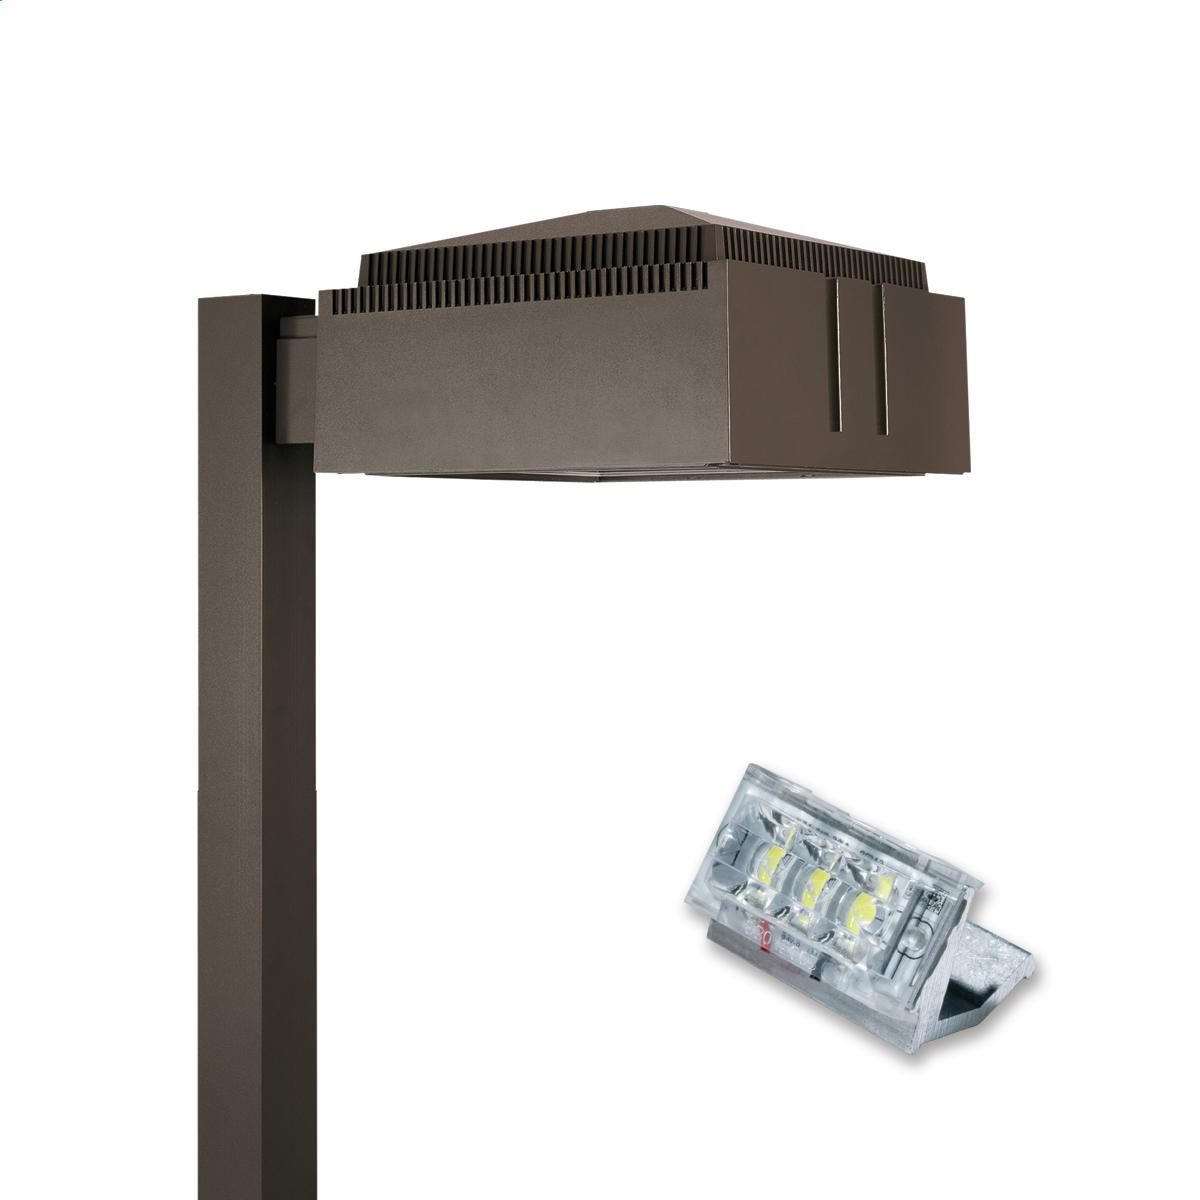 LED Retrofit Kits | Commercial Outdoor Lighting | Lighting